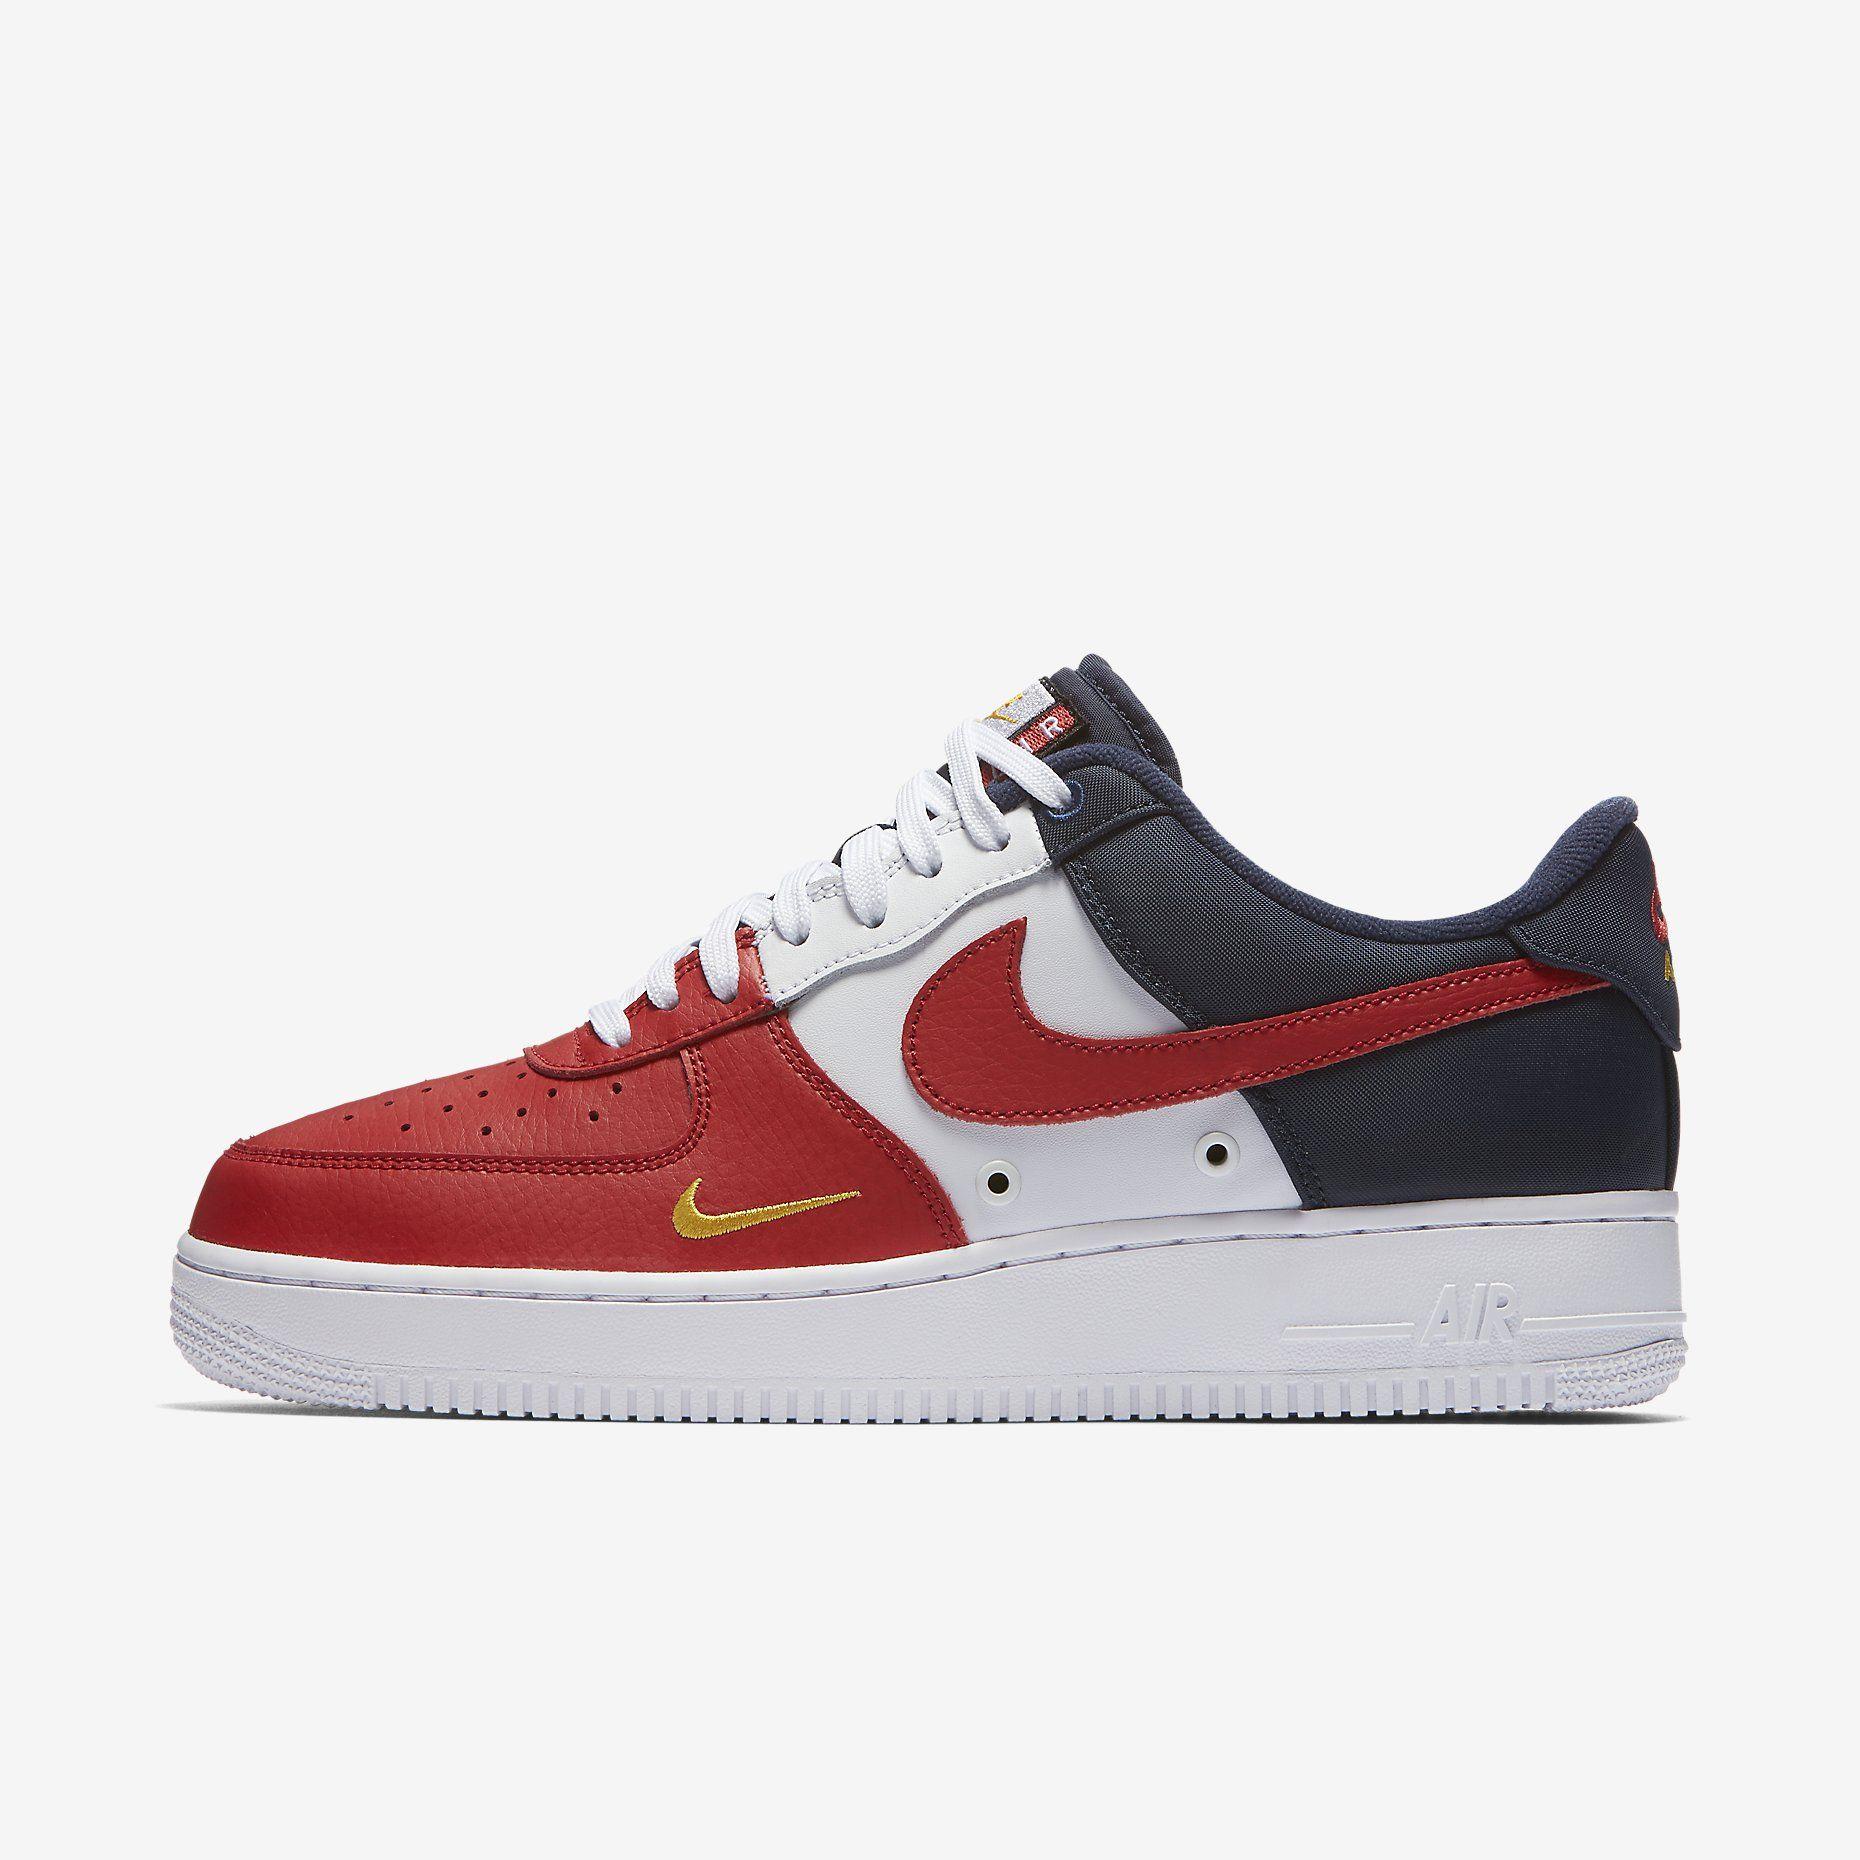 Air Force 1, Nike Air Force, Sneaker Heads, Nike Shoes, University, Red,  Black, Size 12, Kicks